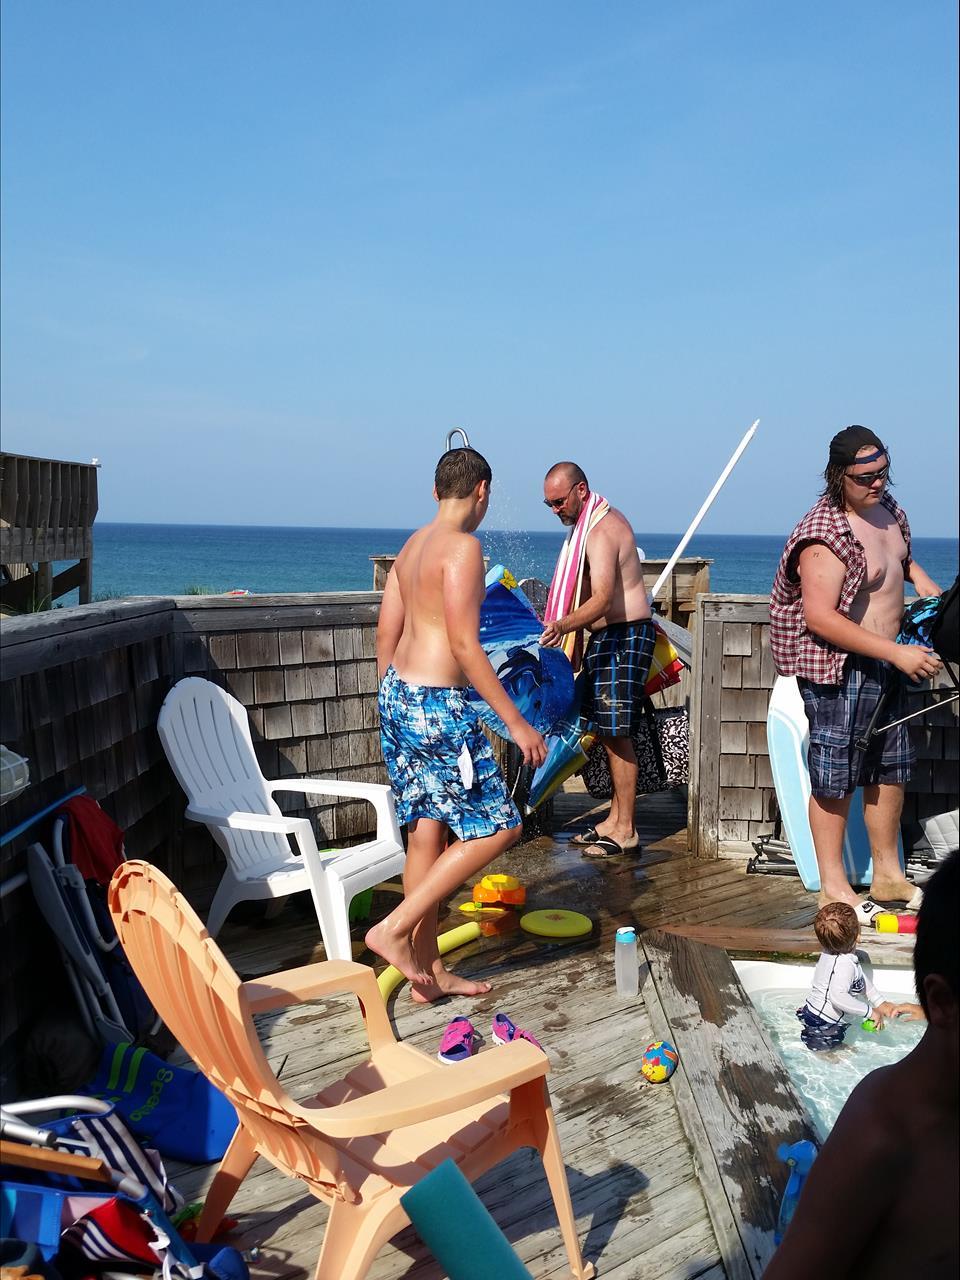 July 2015 Stay - JR05 - Summer Sands, Terry Schalnat